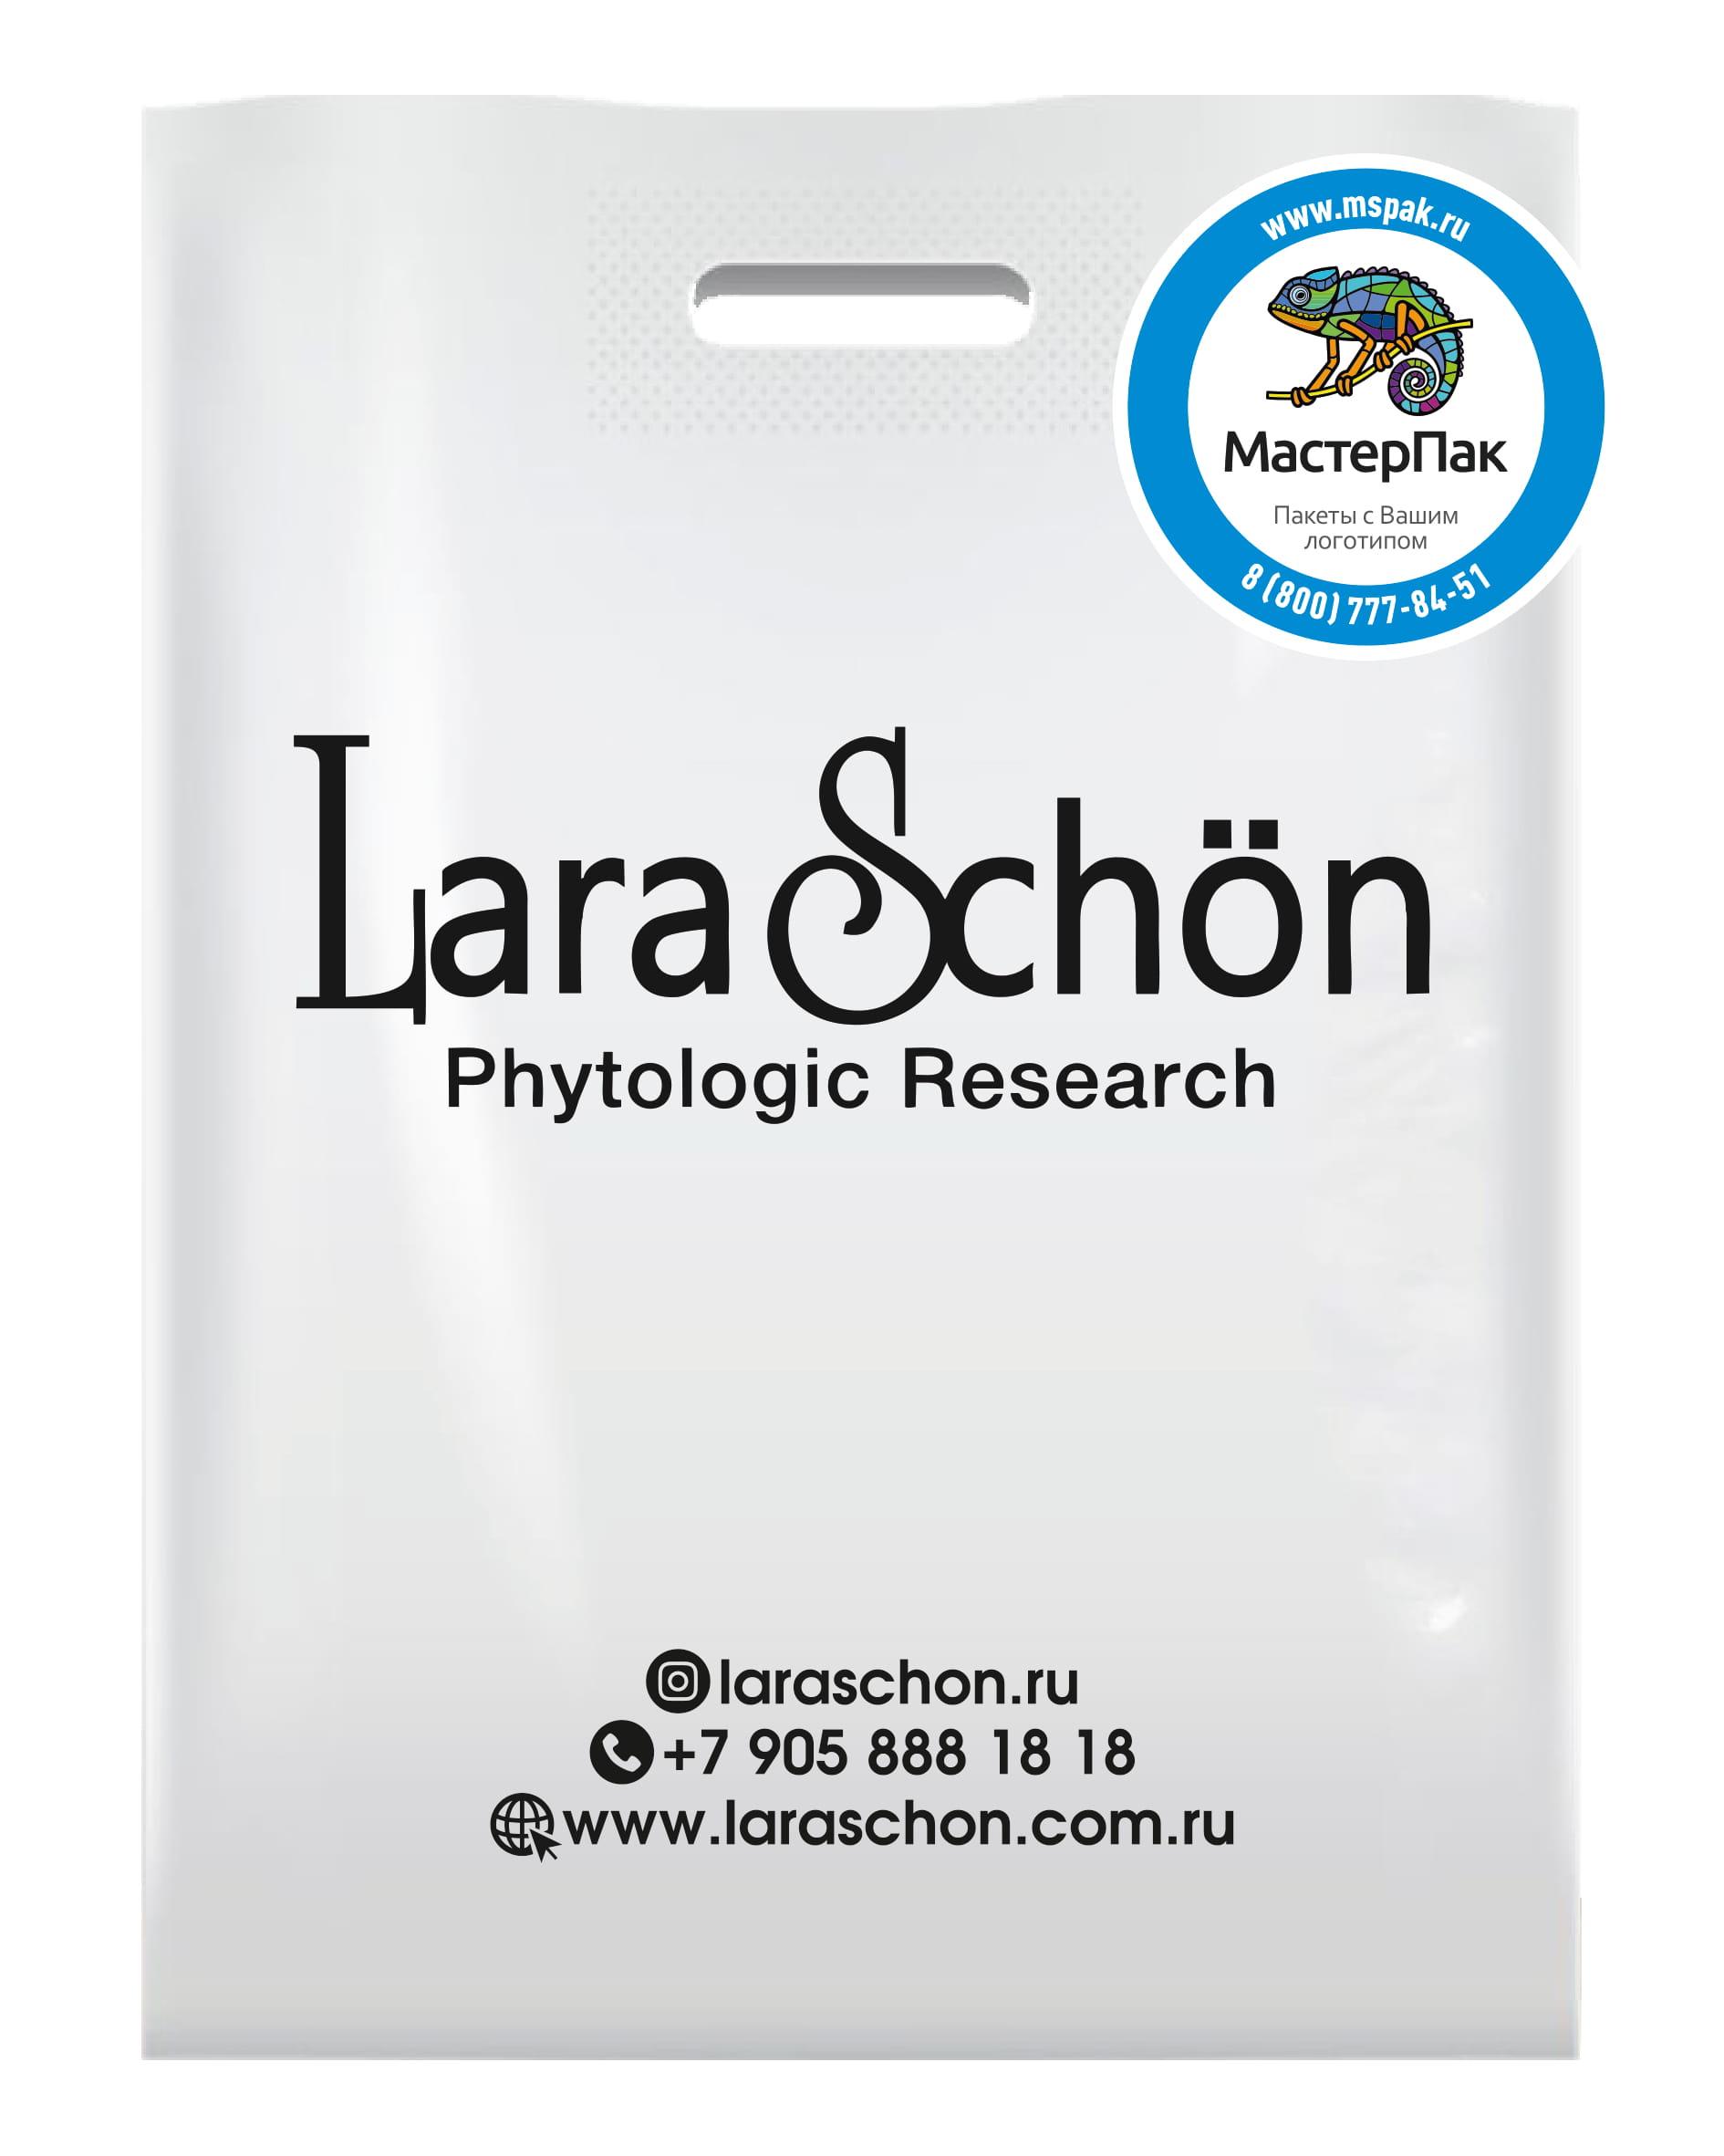 Пакет ПВД с логотипом Lara Schon, Москва, 70 мкм, 30*40 см